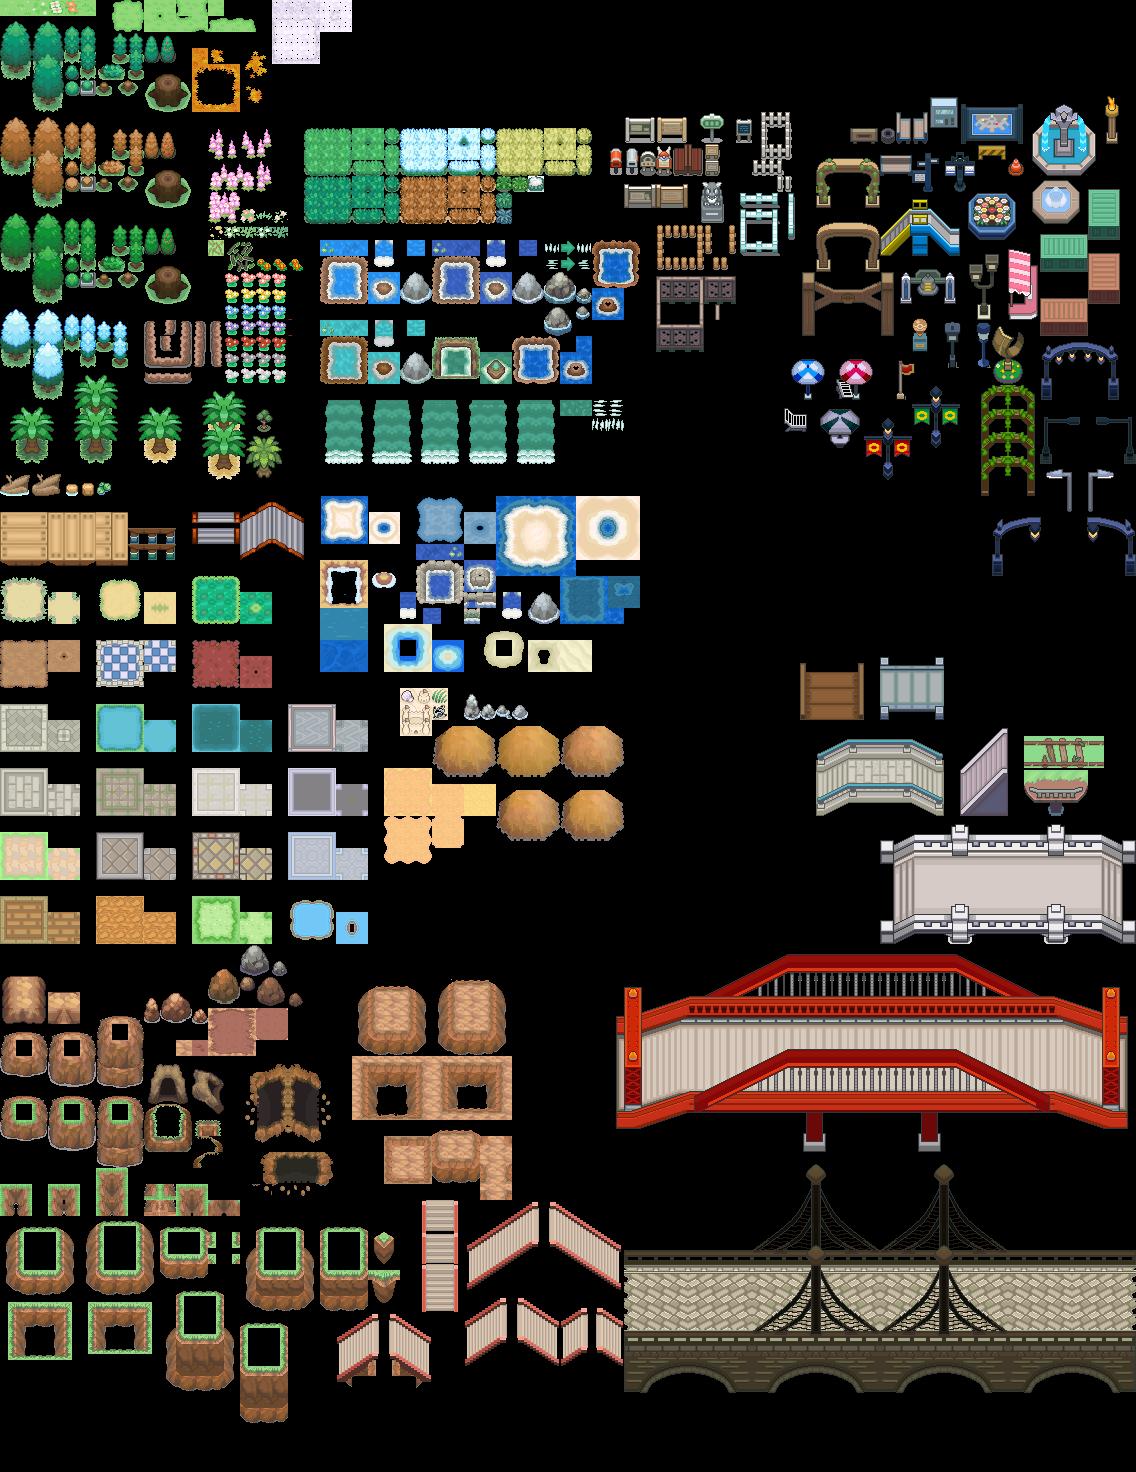 Pokémon-Tileset: Hilfe beim BW ultimate Tileset